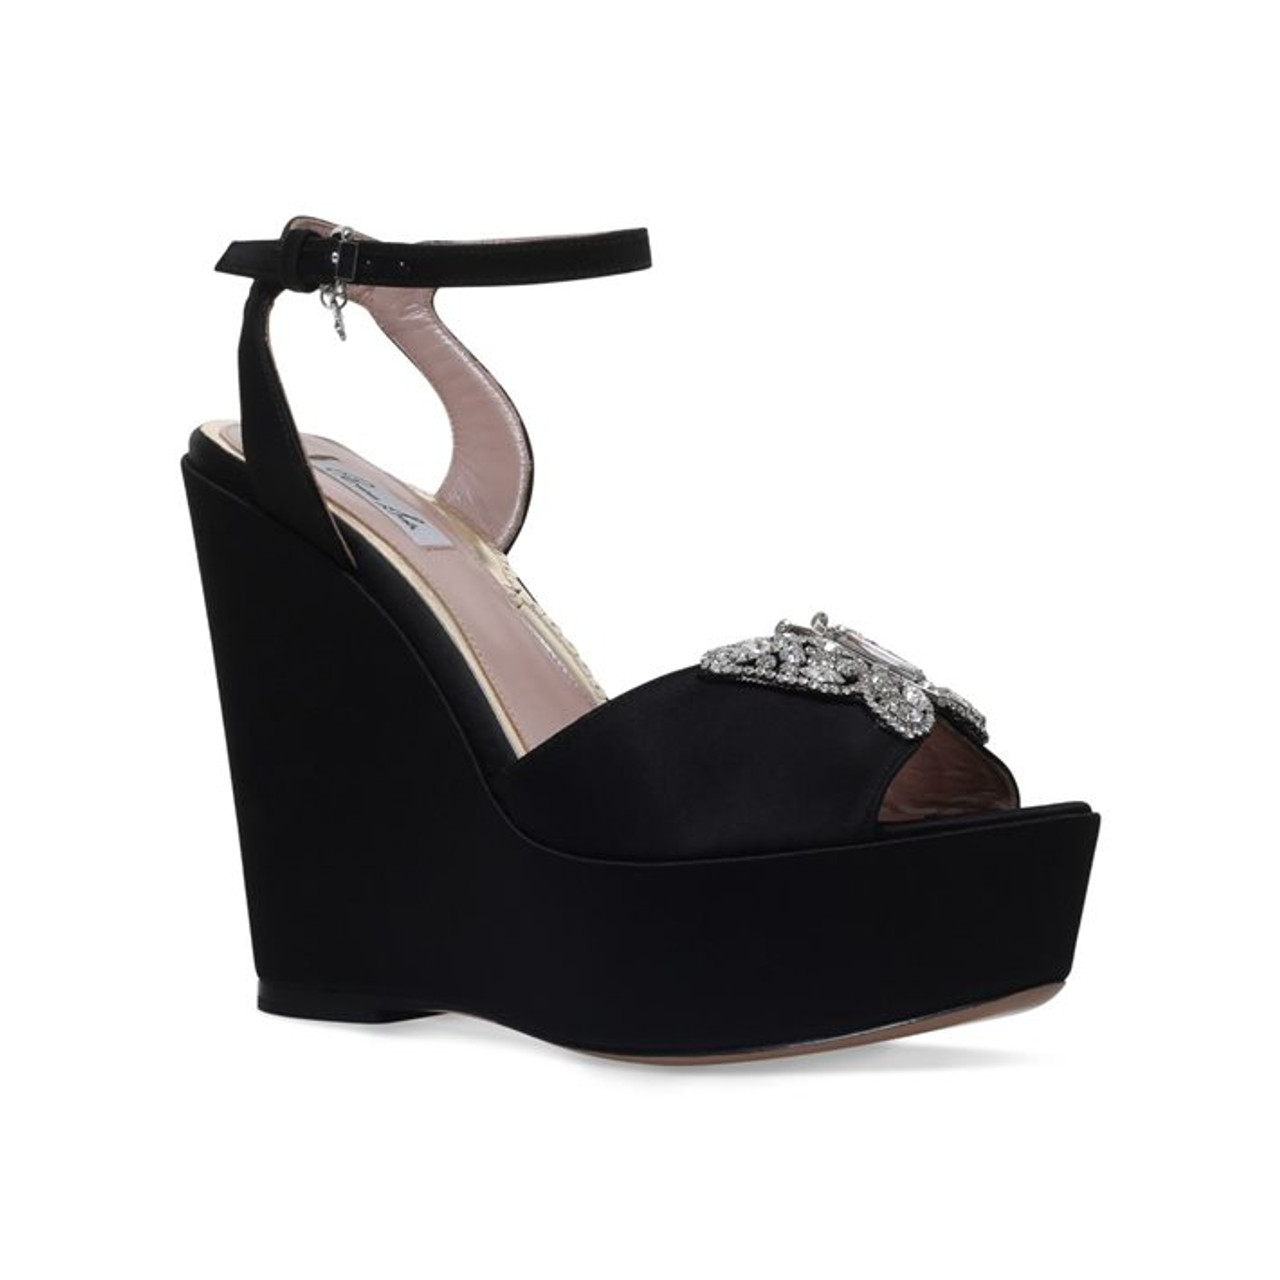 Ambrosine Wedge Heel Black Satin